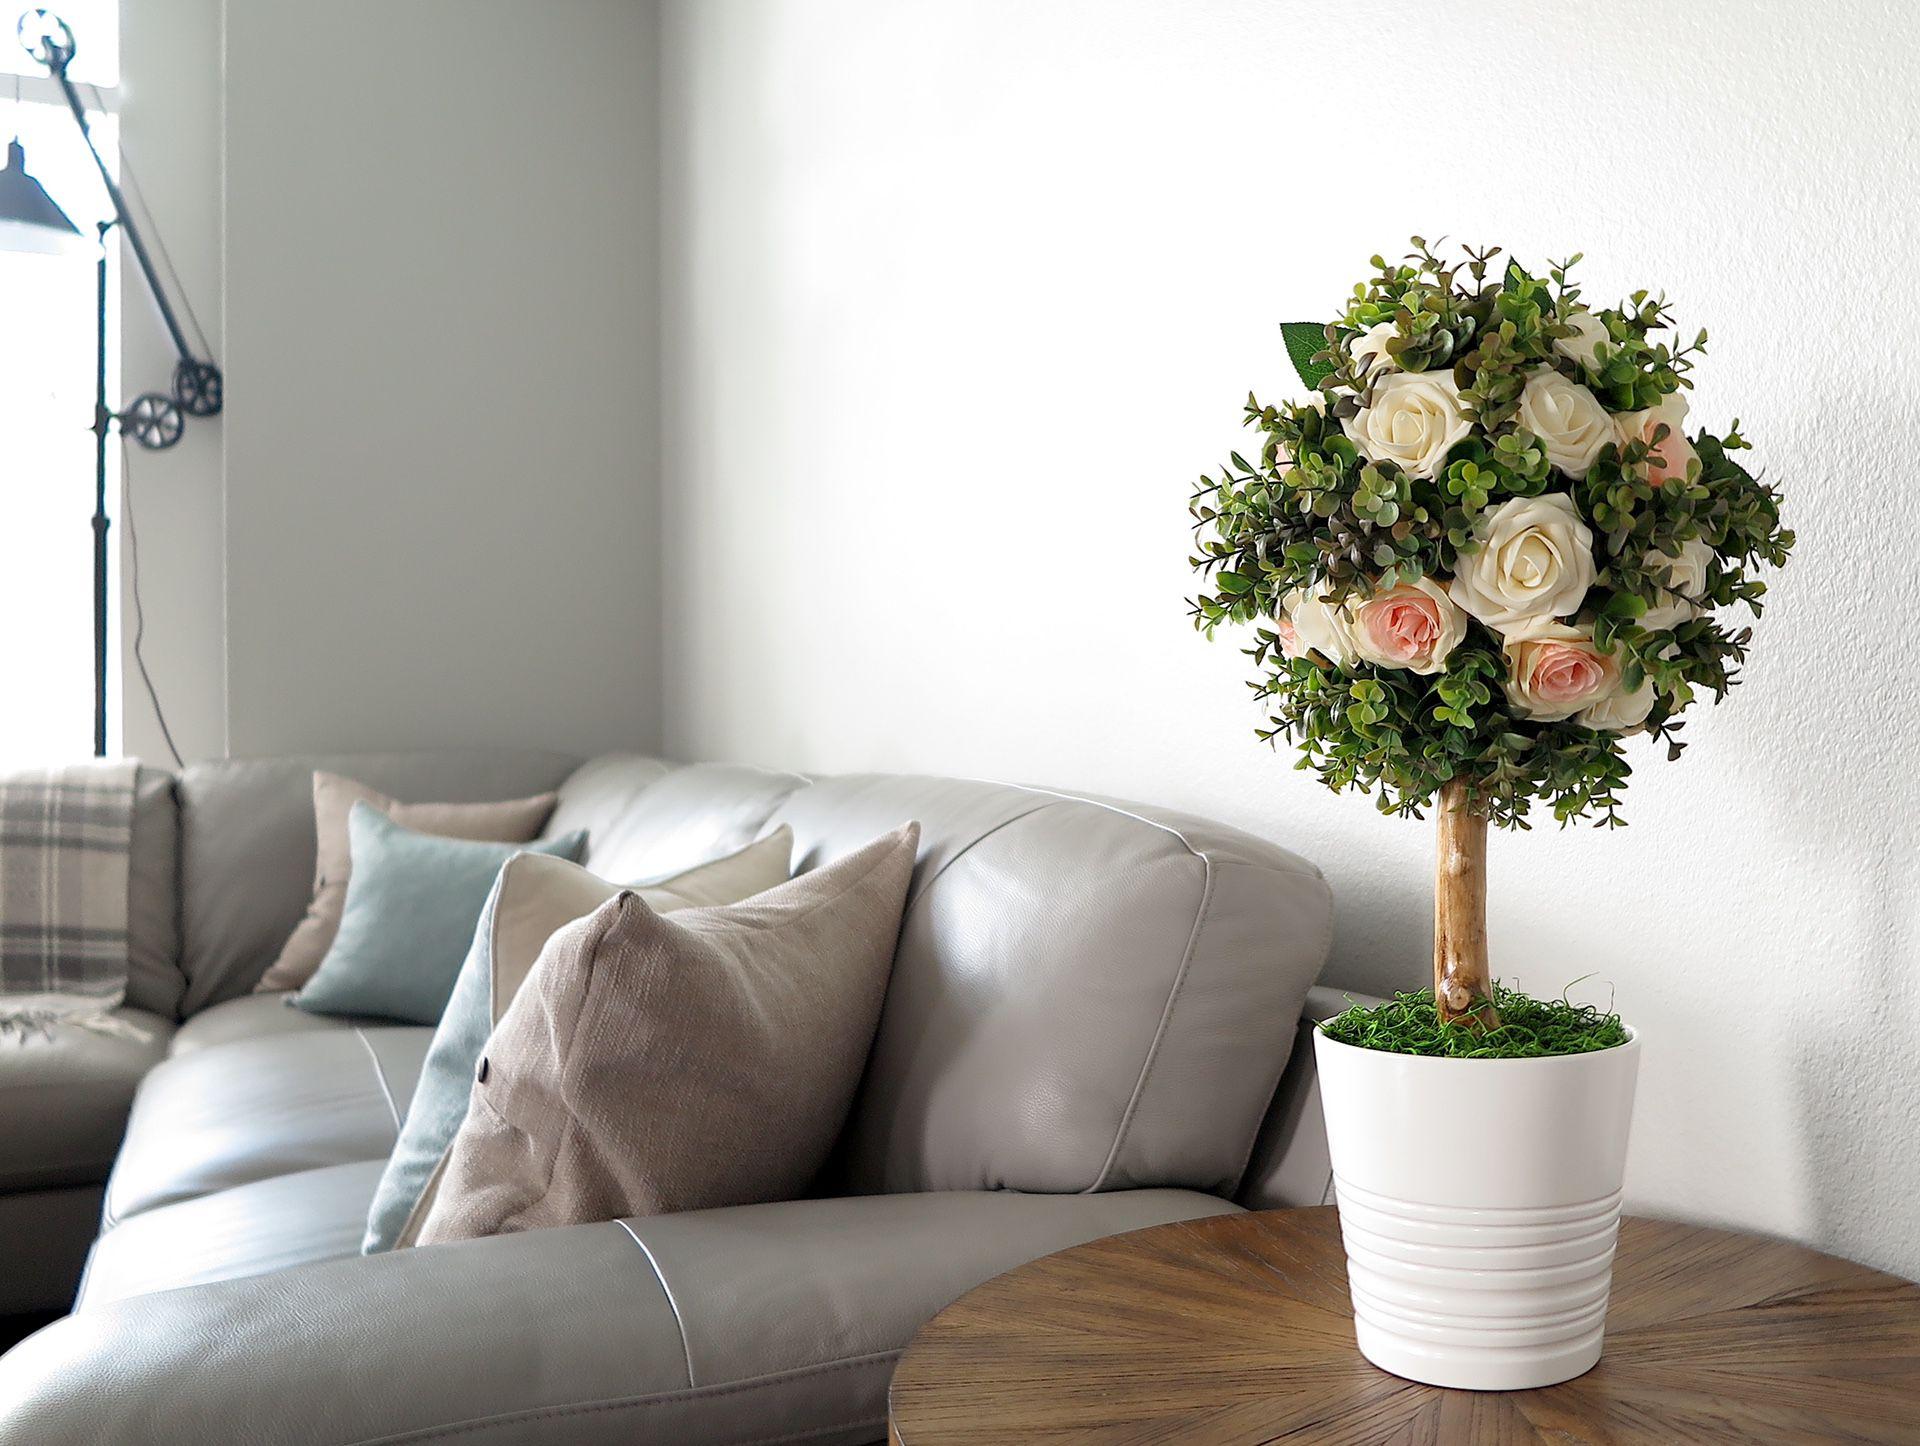 Home Decor, Topiary Tree, Floral Arrangement